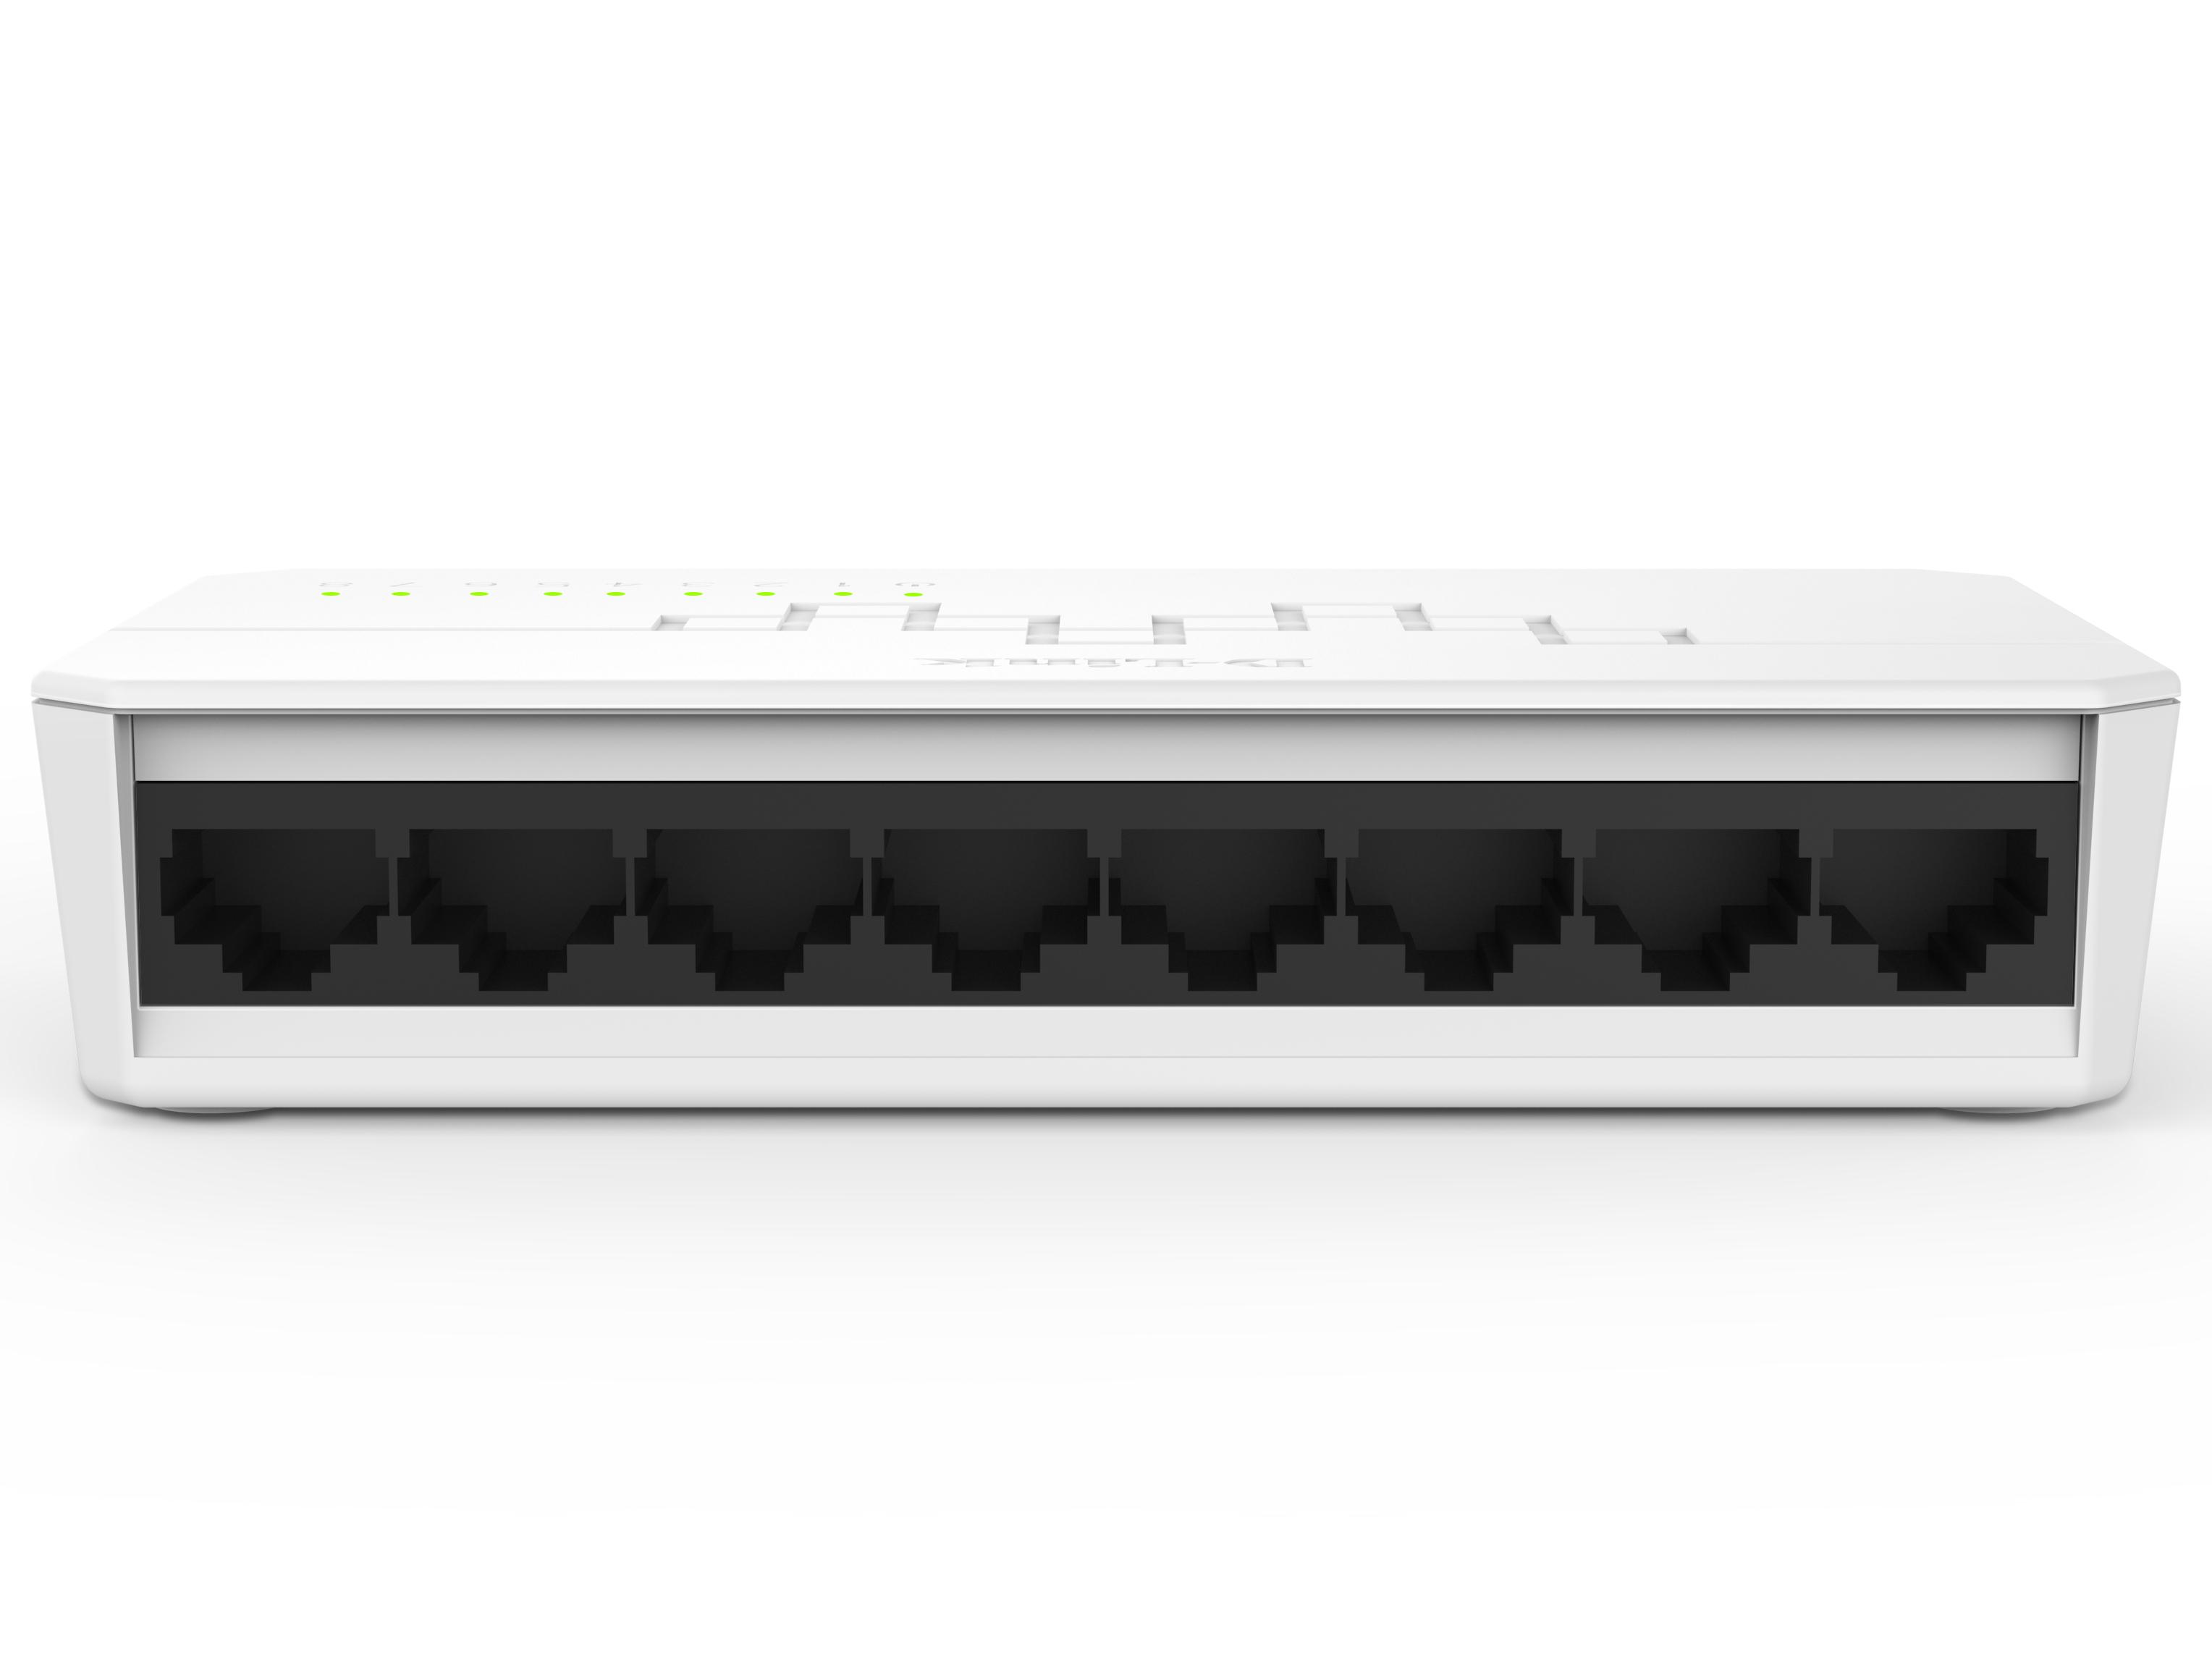 D-LINK DES-1008C-CN 8口百兆非网管交换机 8个百兆电口,塑壳桌面型,非网管交换机